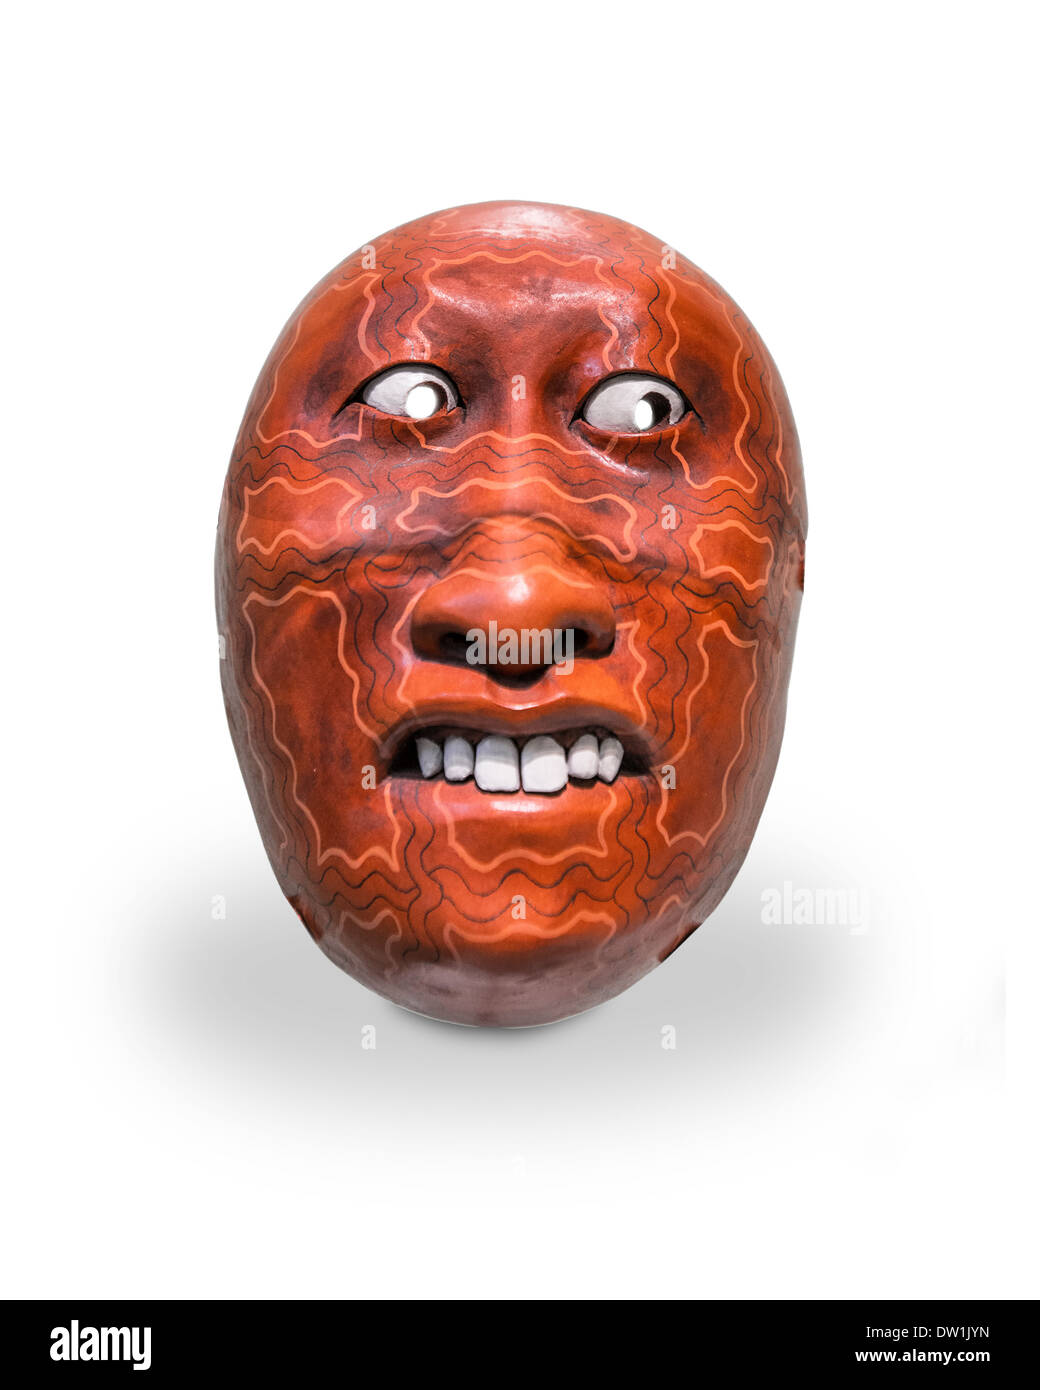 a comical Hopi life mask made of chocolate - Stock Image